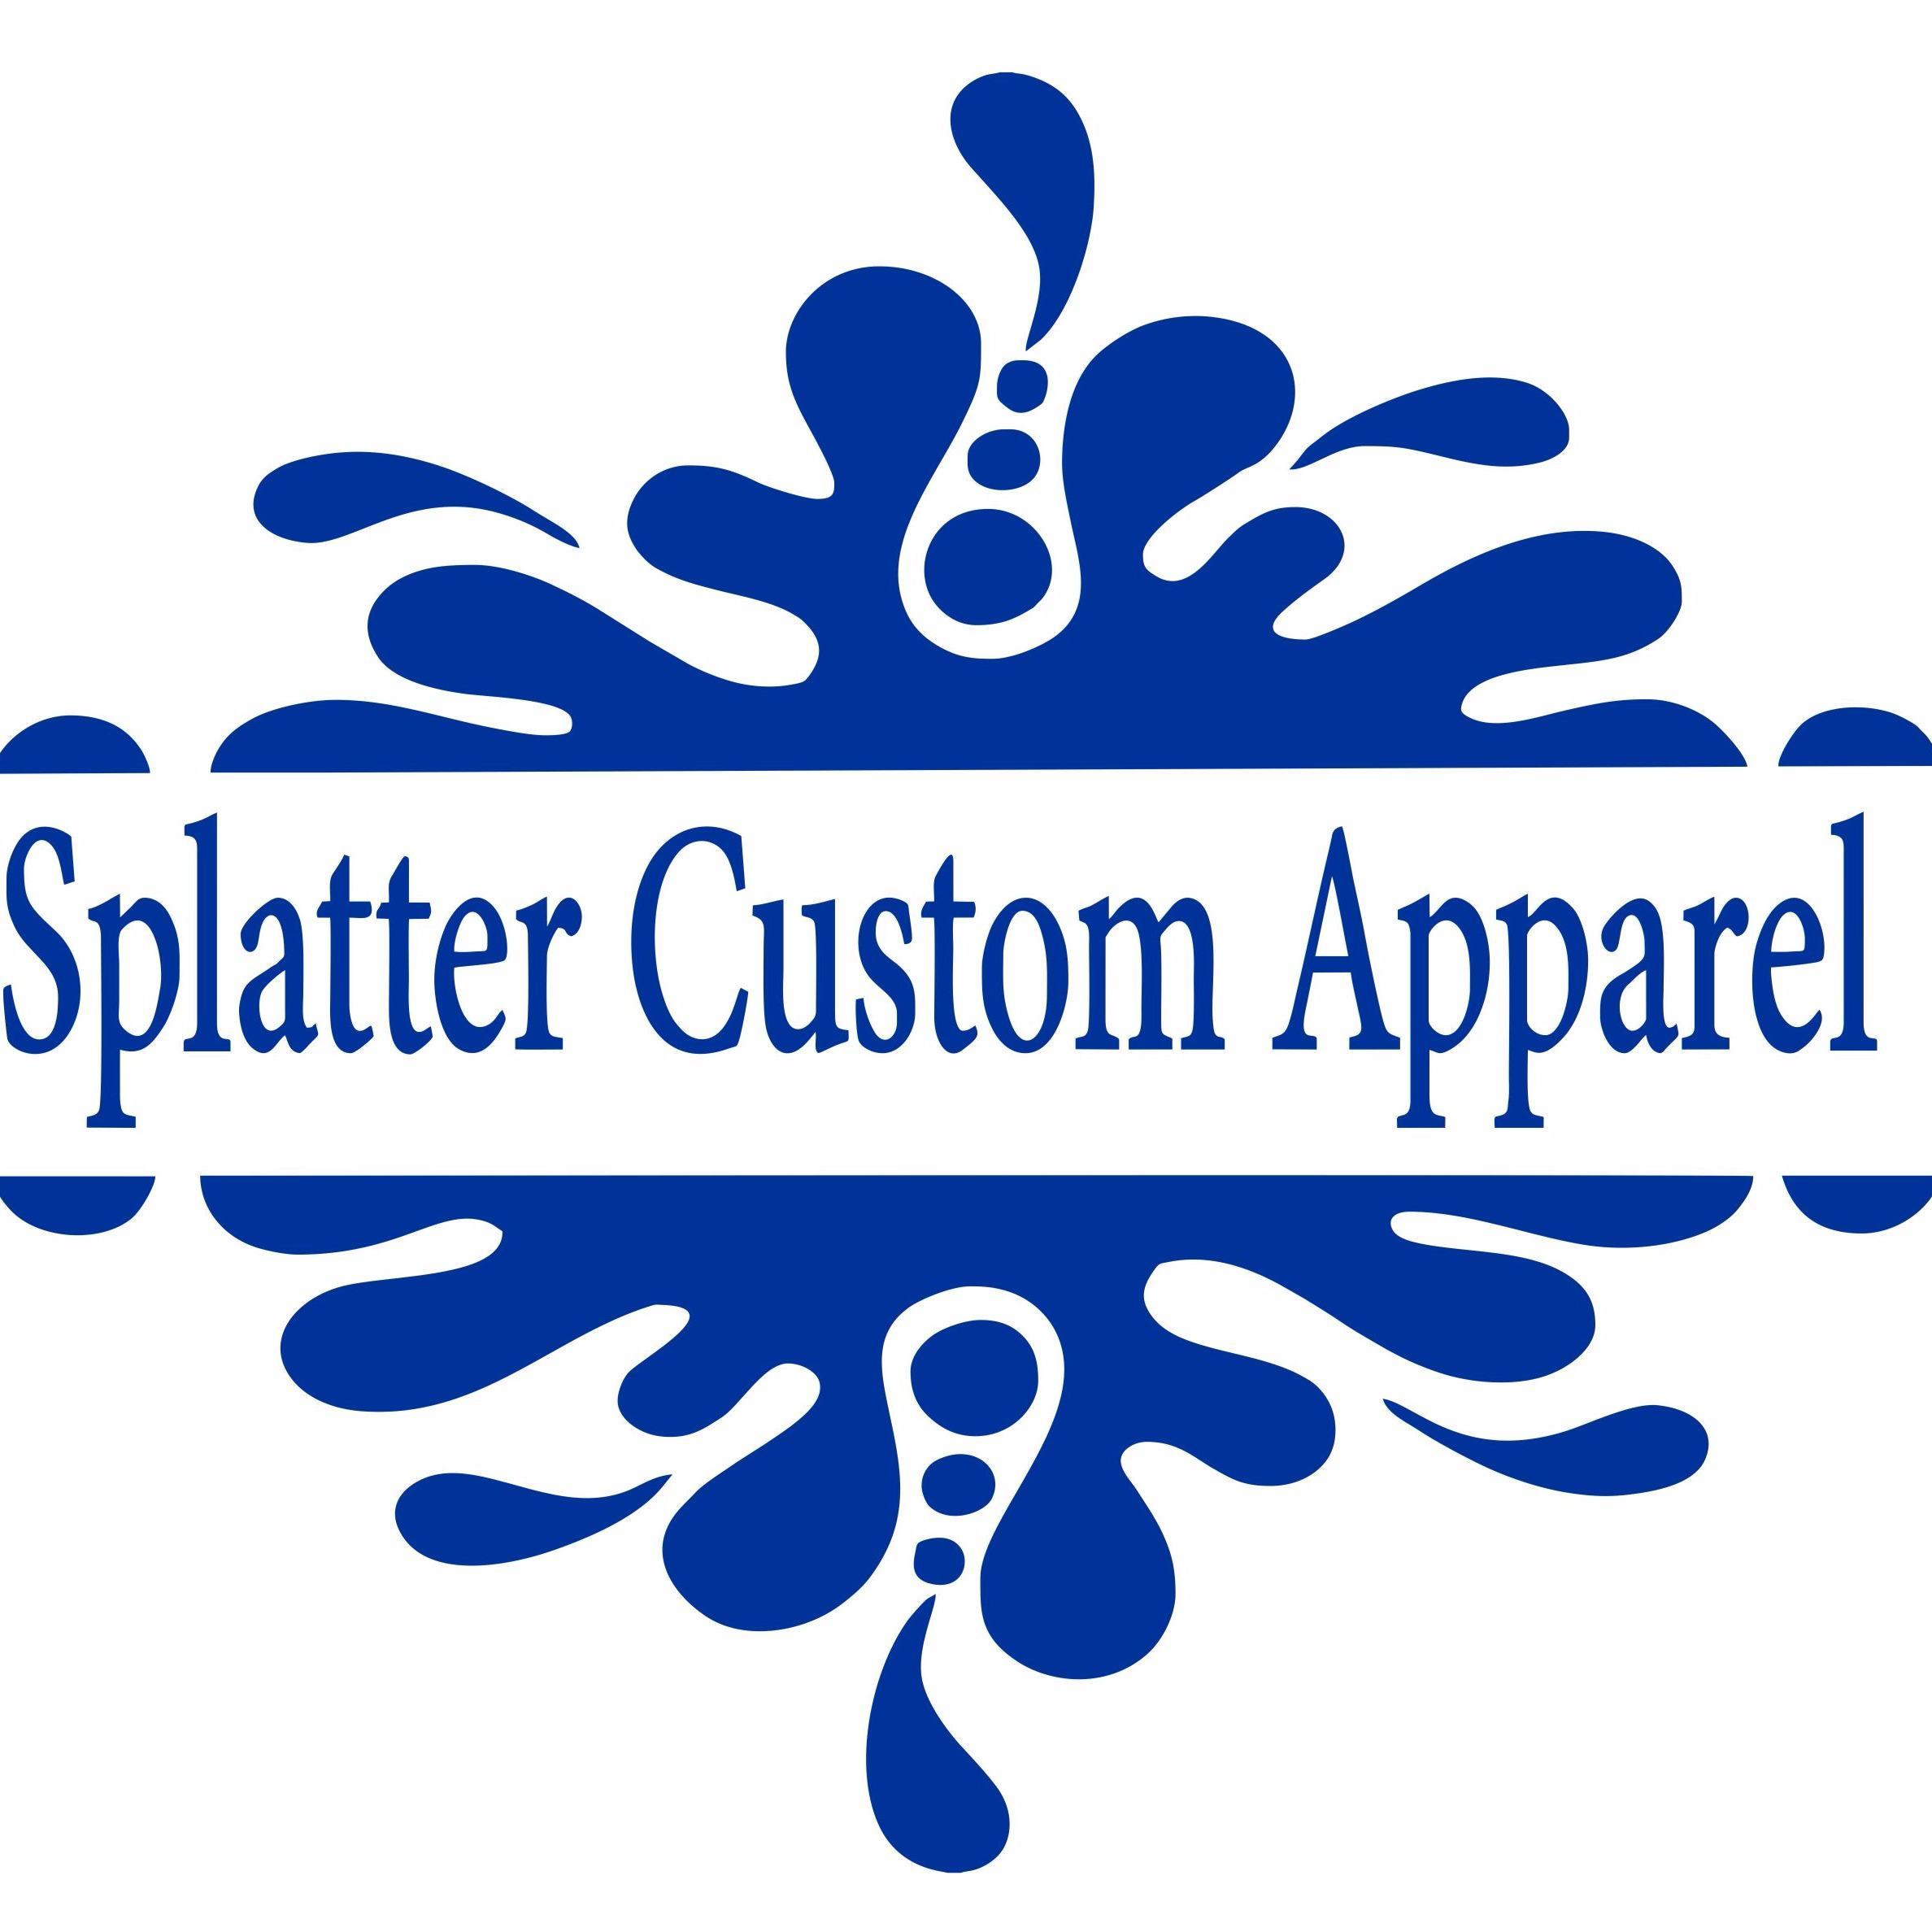 Splatter custom apparel coupons near me in bergen 8coupons for Custom shirt stores near me